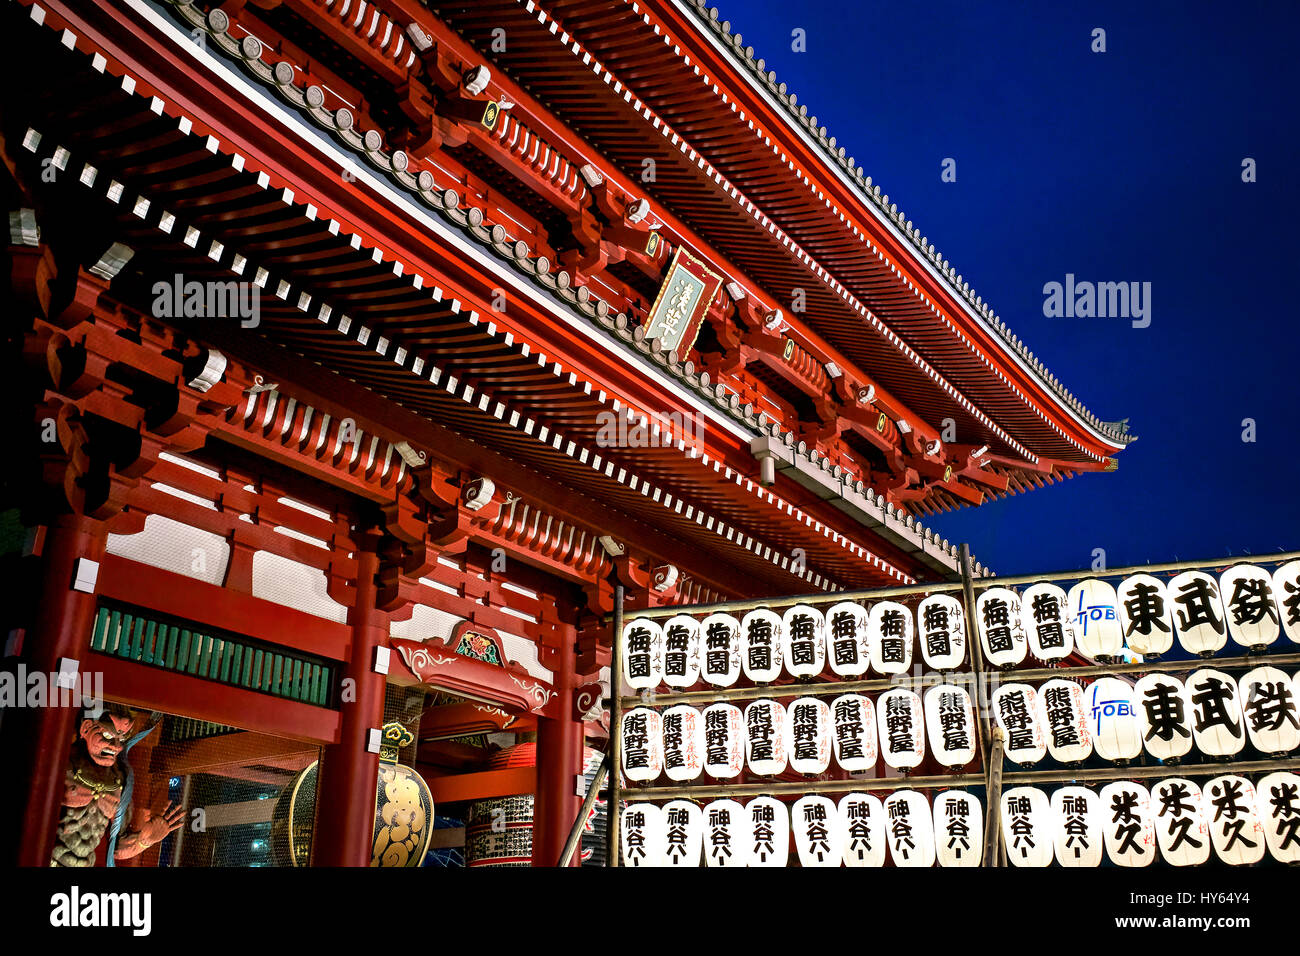 Japan, Honshu island, Kanto, Tokyo, Asakusa, Senso-ji shrine. - Stock Image